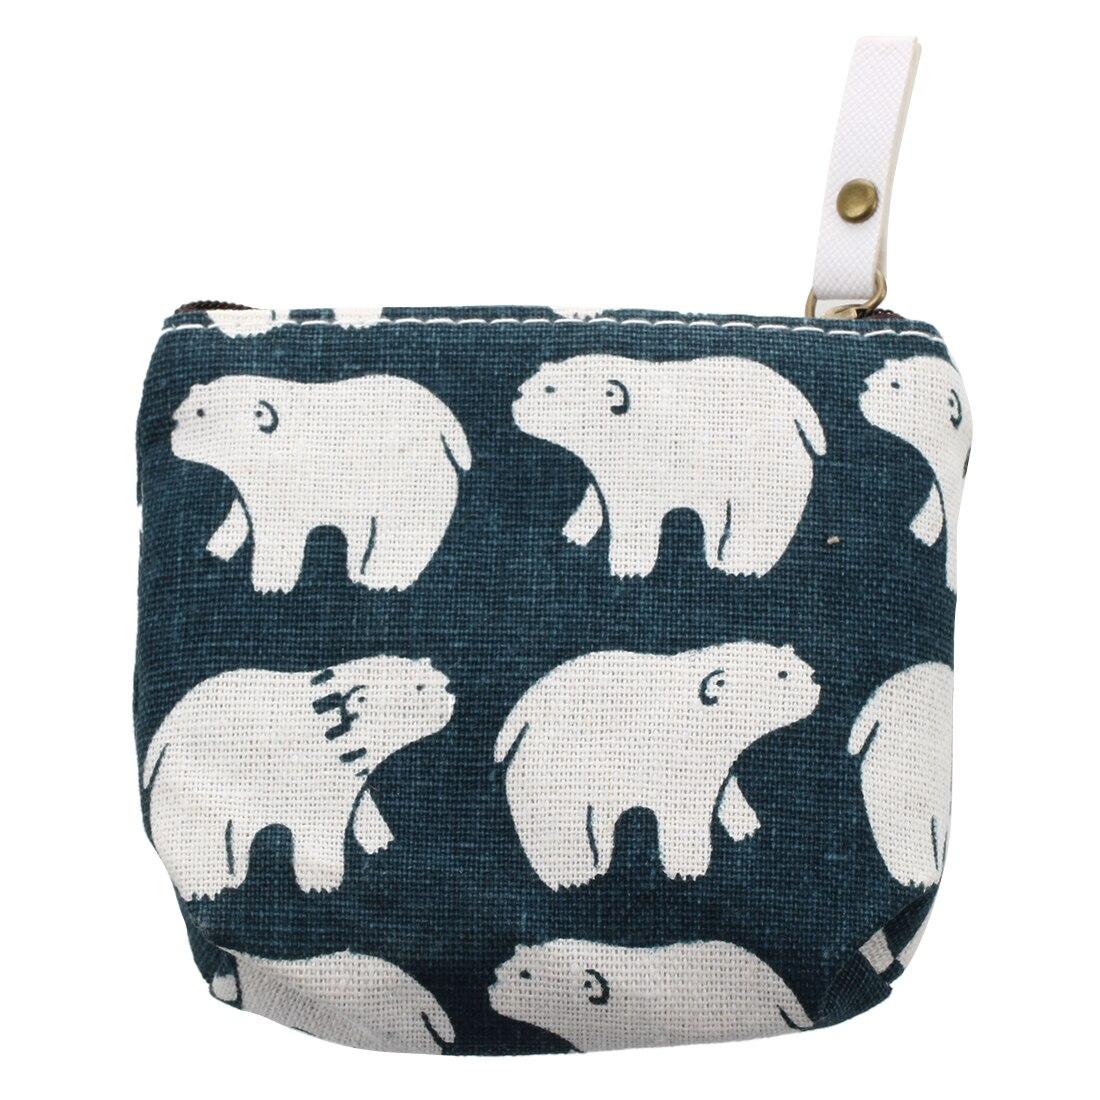 TEXU Cute Cartoon Animals Canvas Coin Purse women kids Key Wallet Mini change Bag Gift